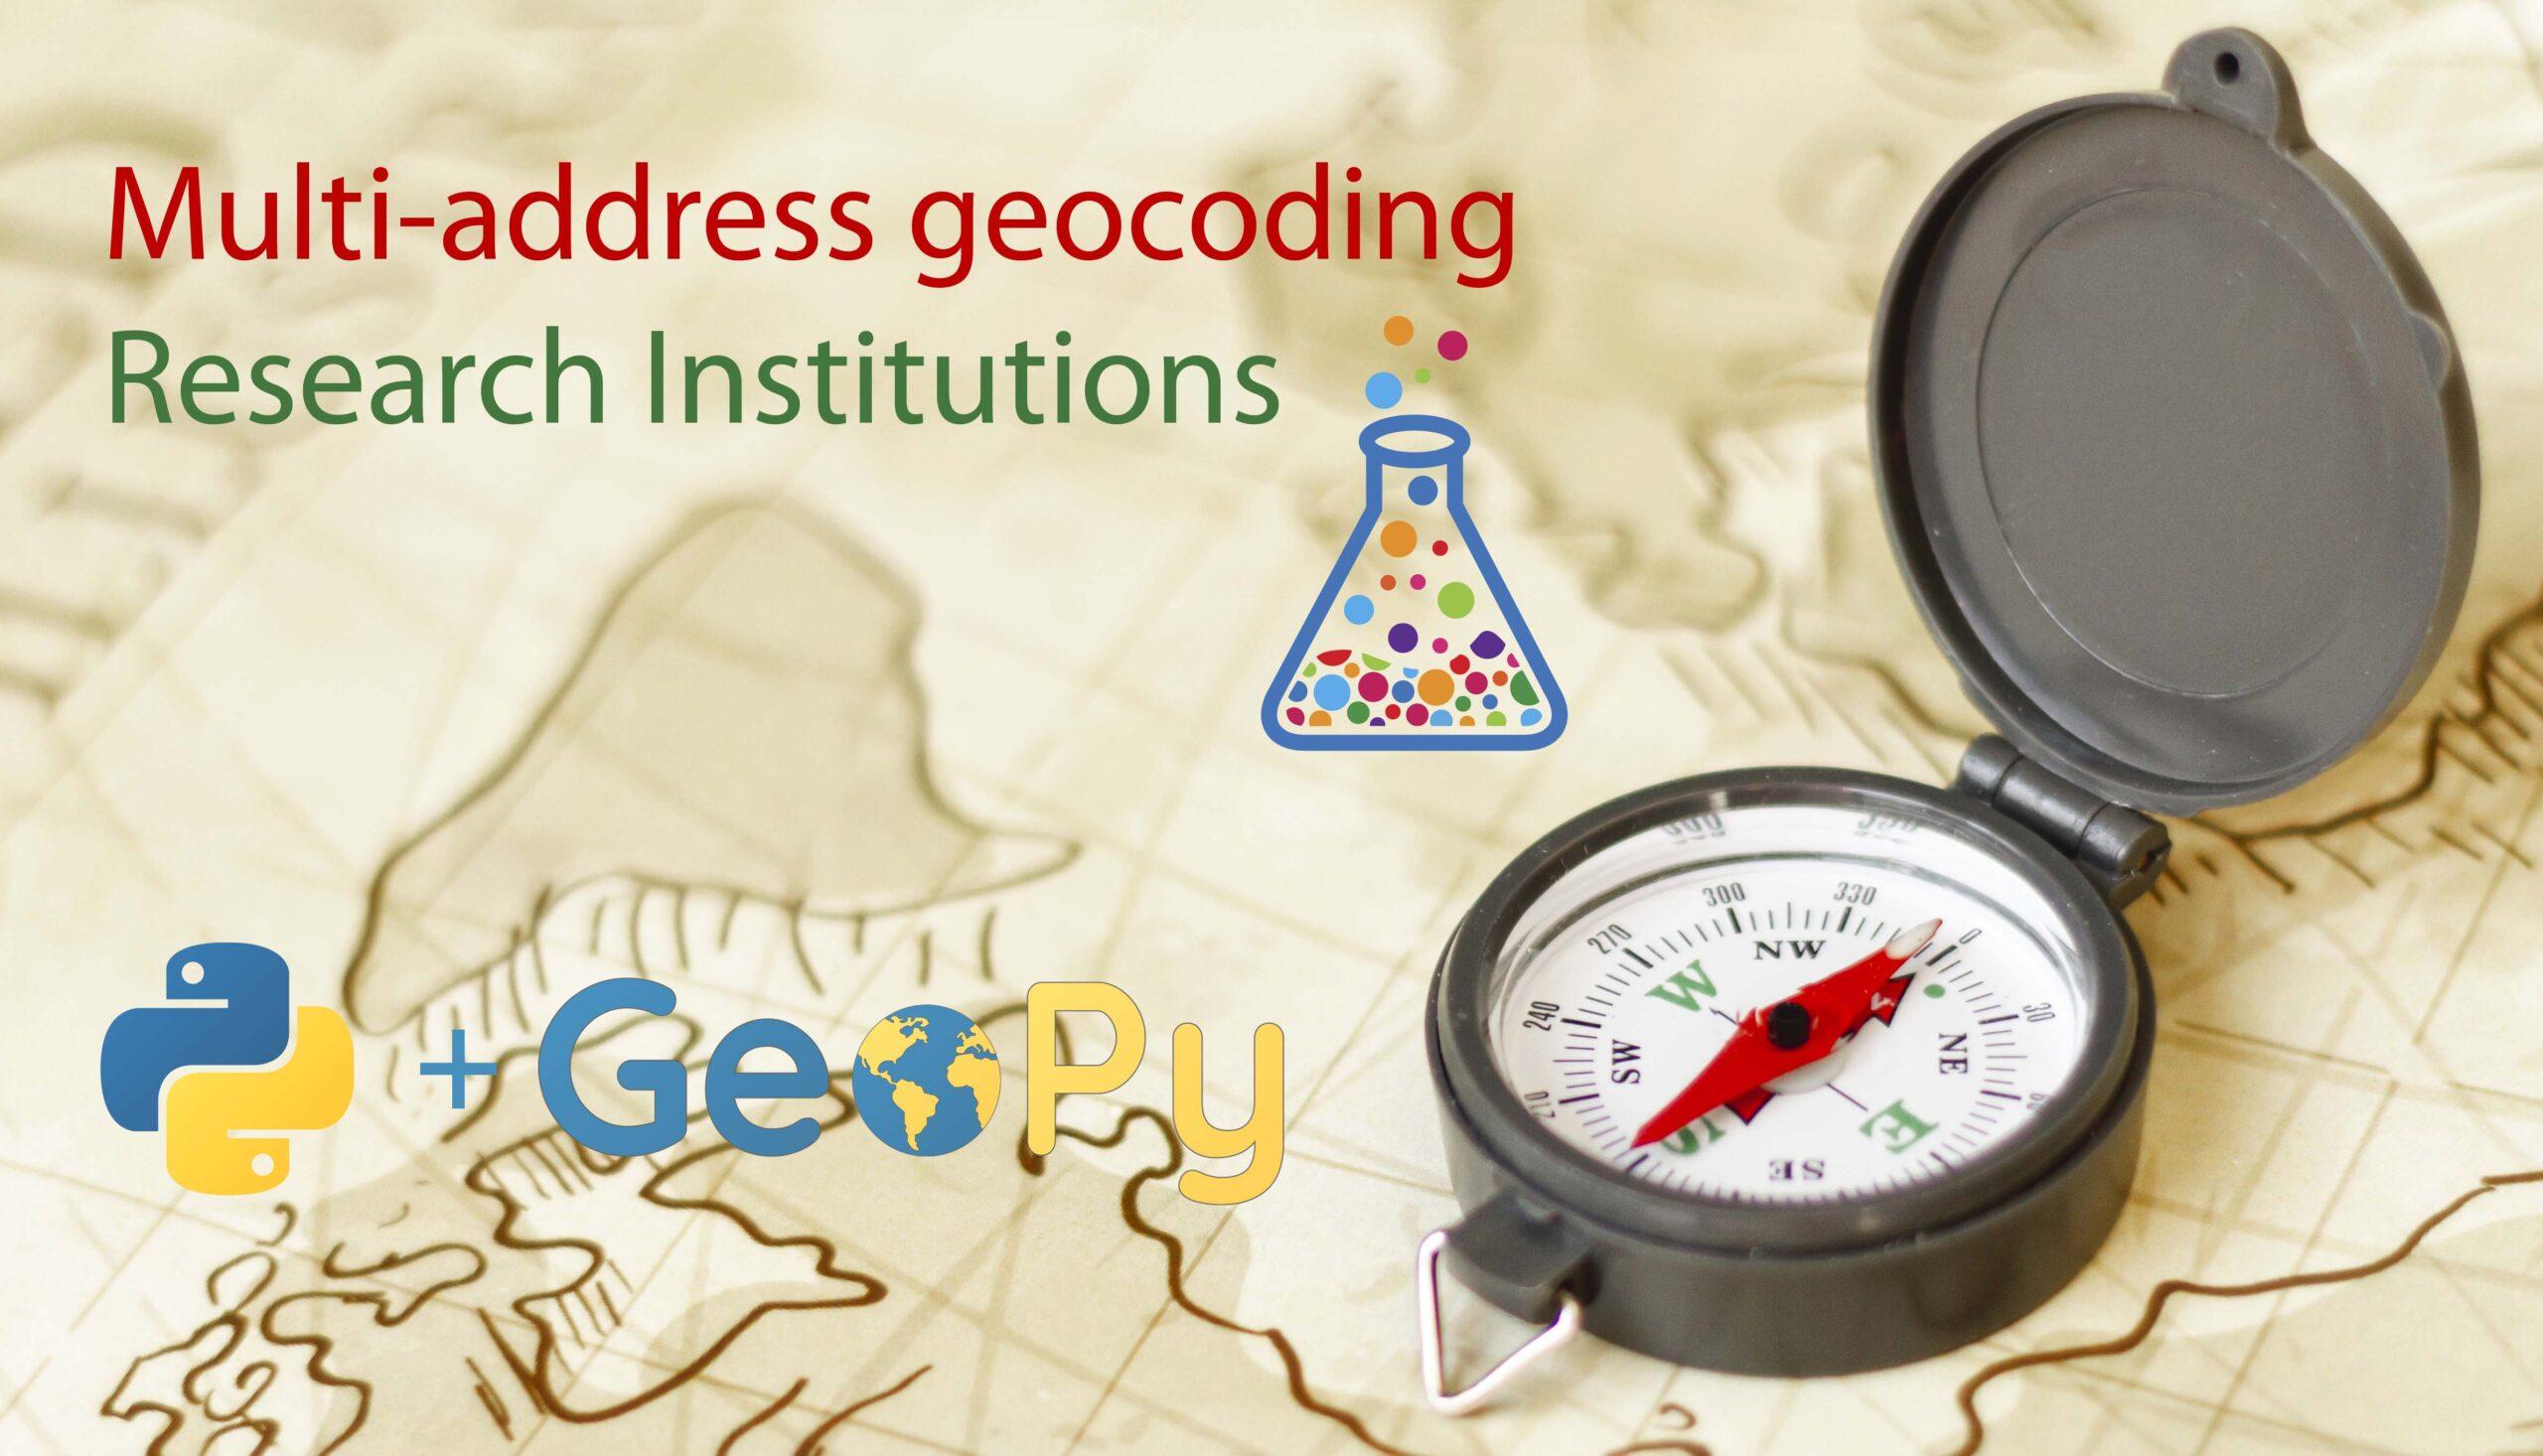 Multi-address geocoding con Geopy and Python